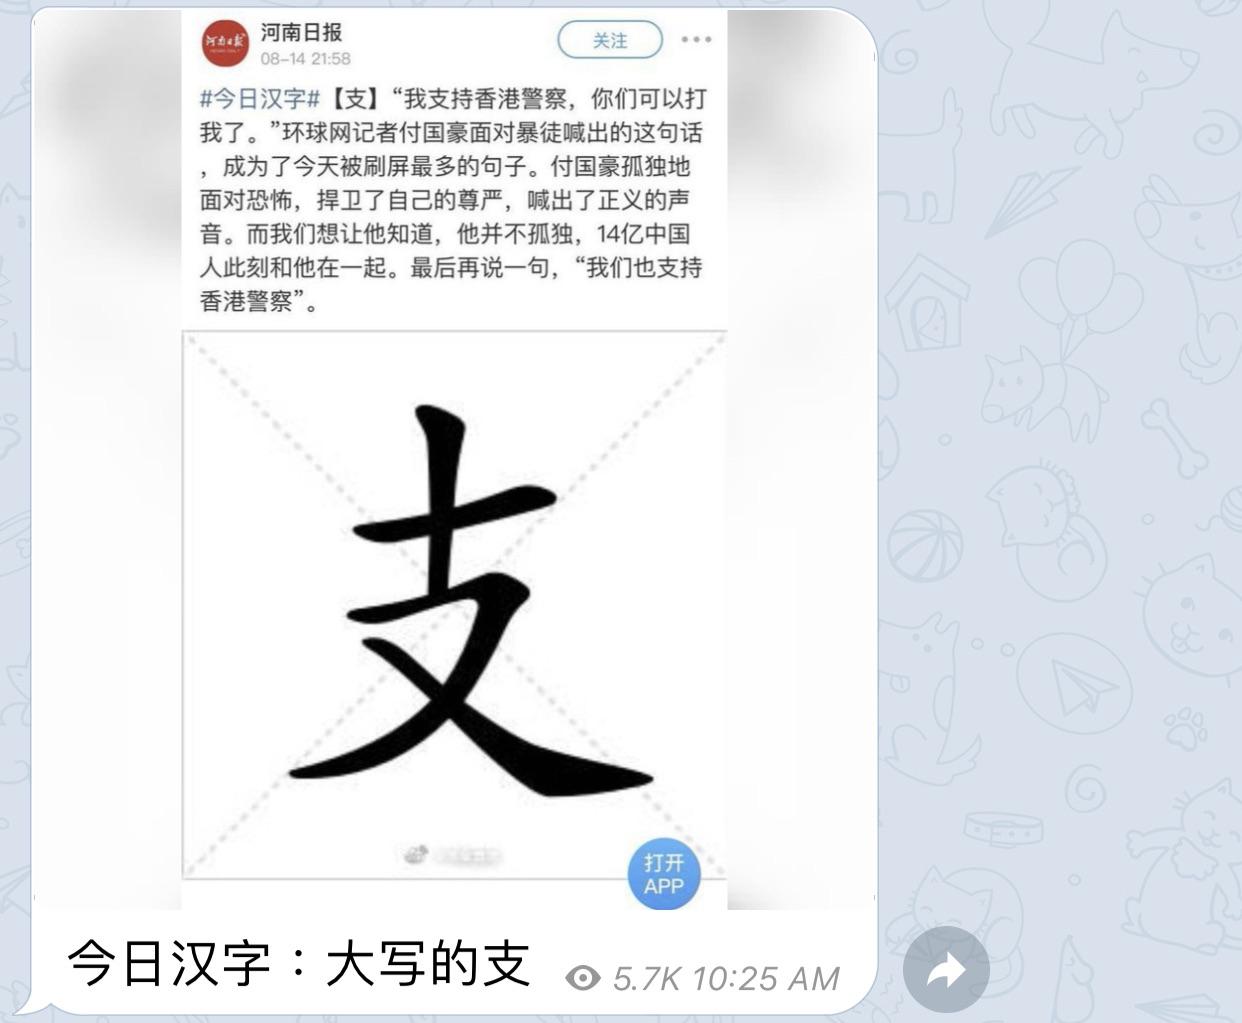 [img]https://upload.cc/i1/2019/08/22/z6V59C.png[/img]